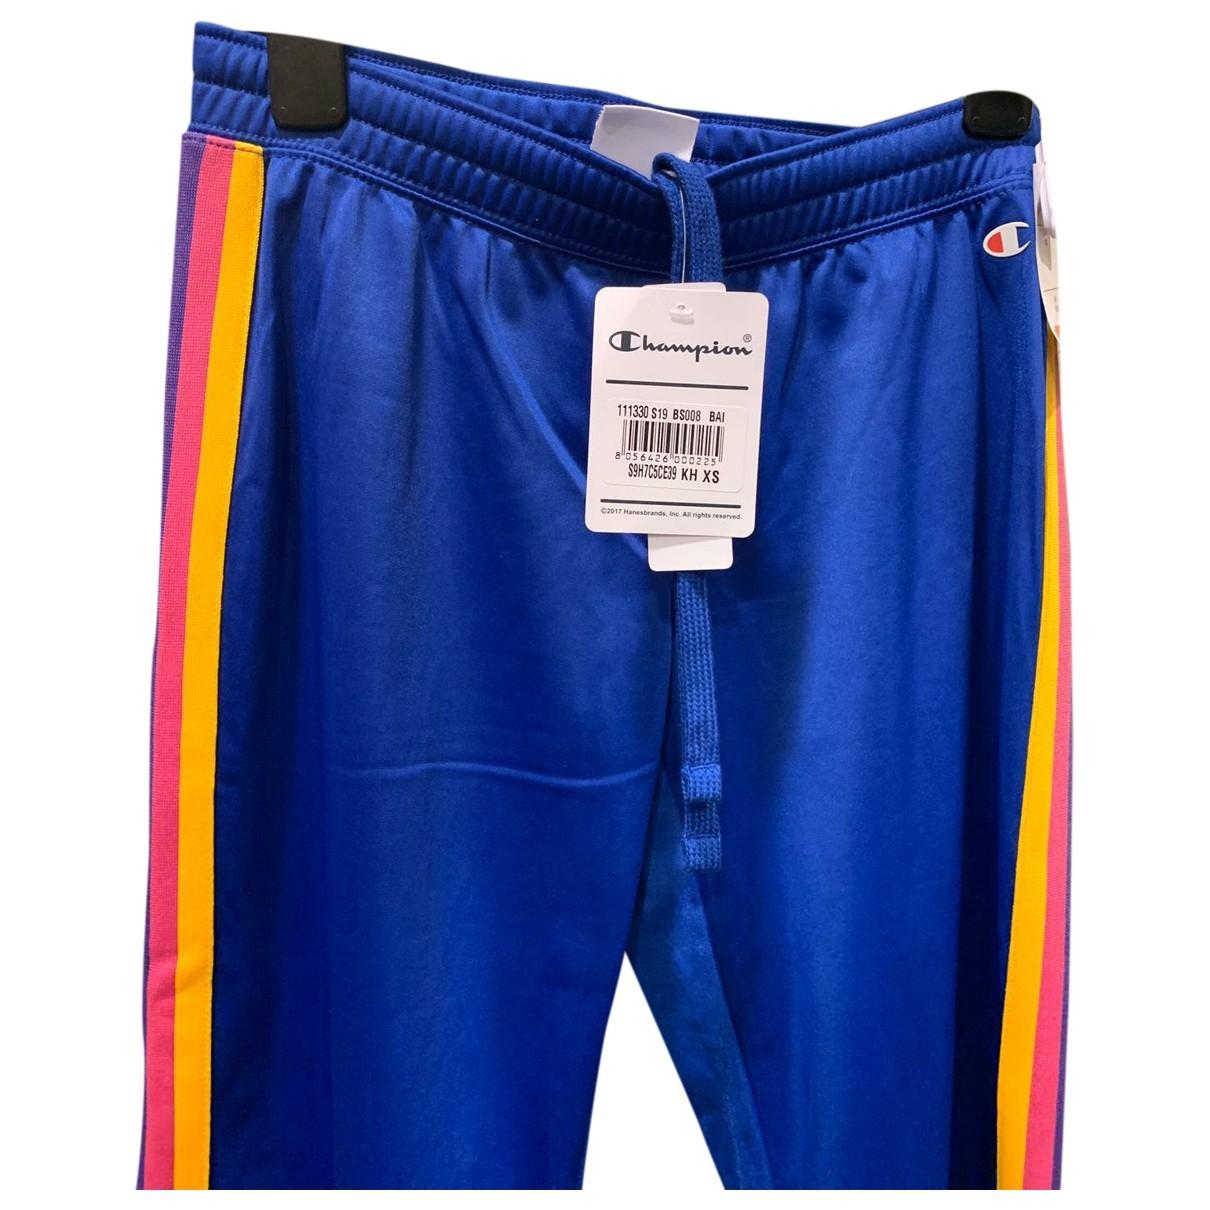 Champion \N Blue Trousers for Women XS International